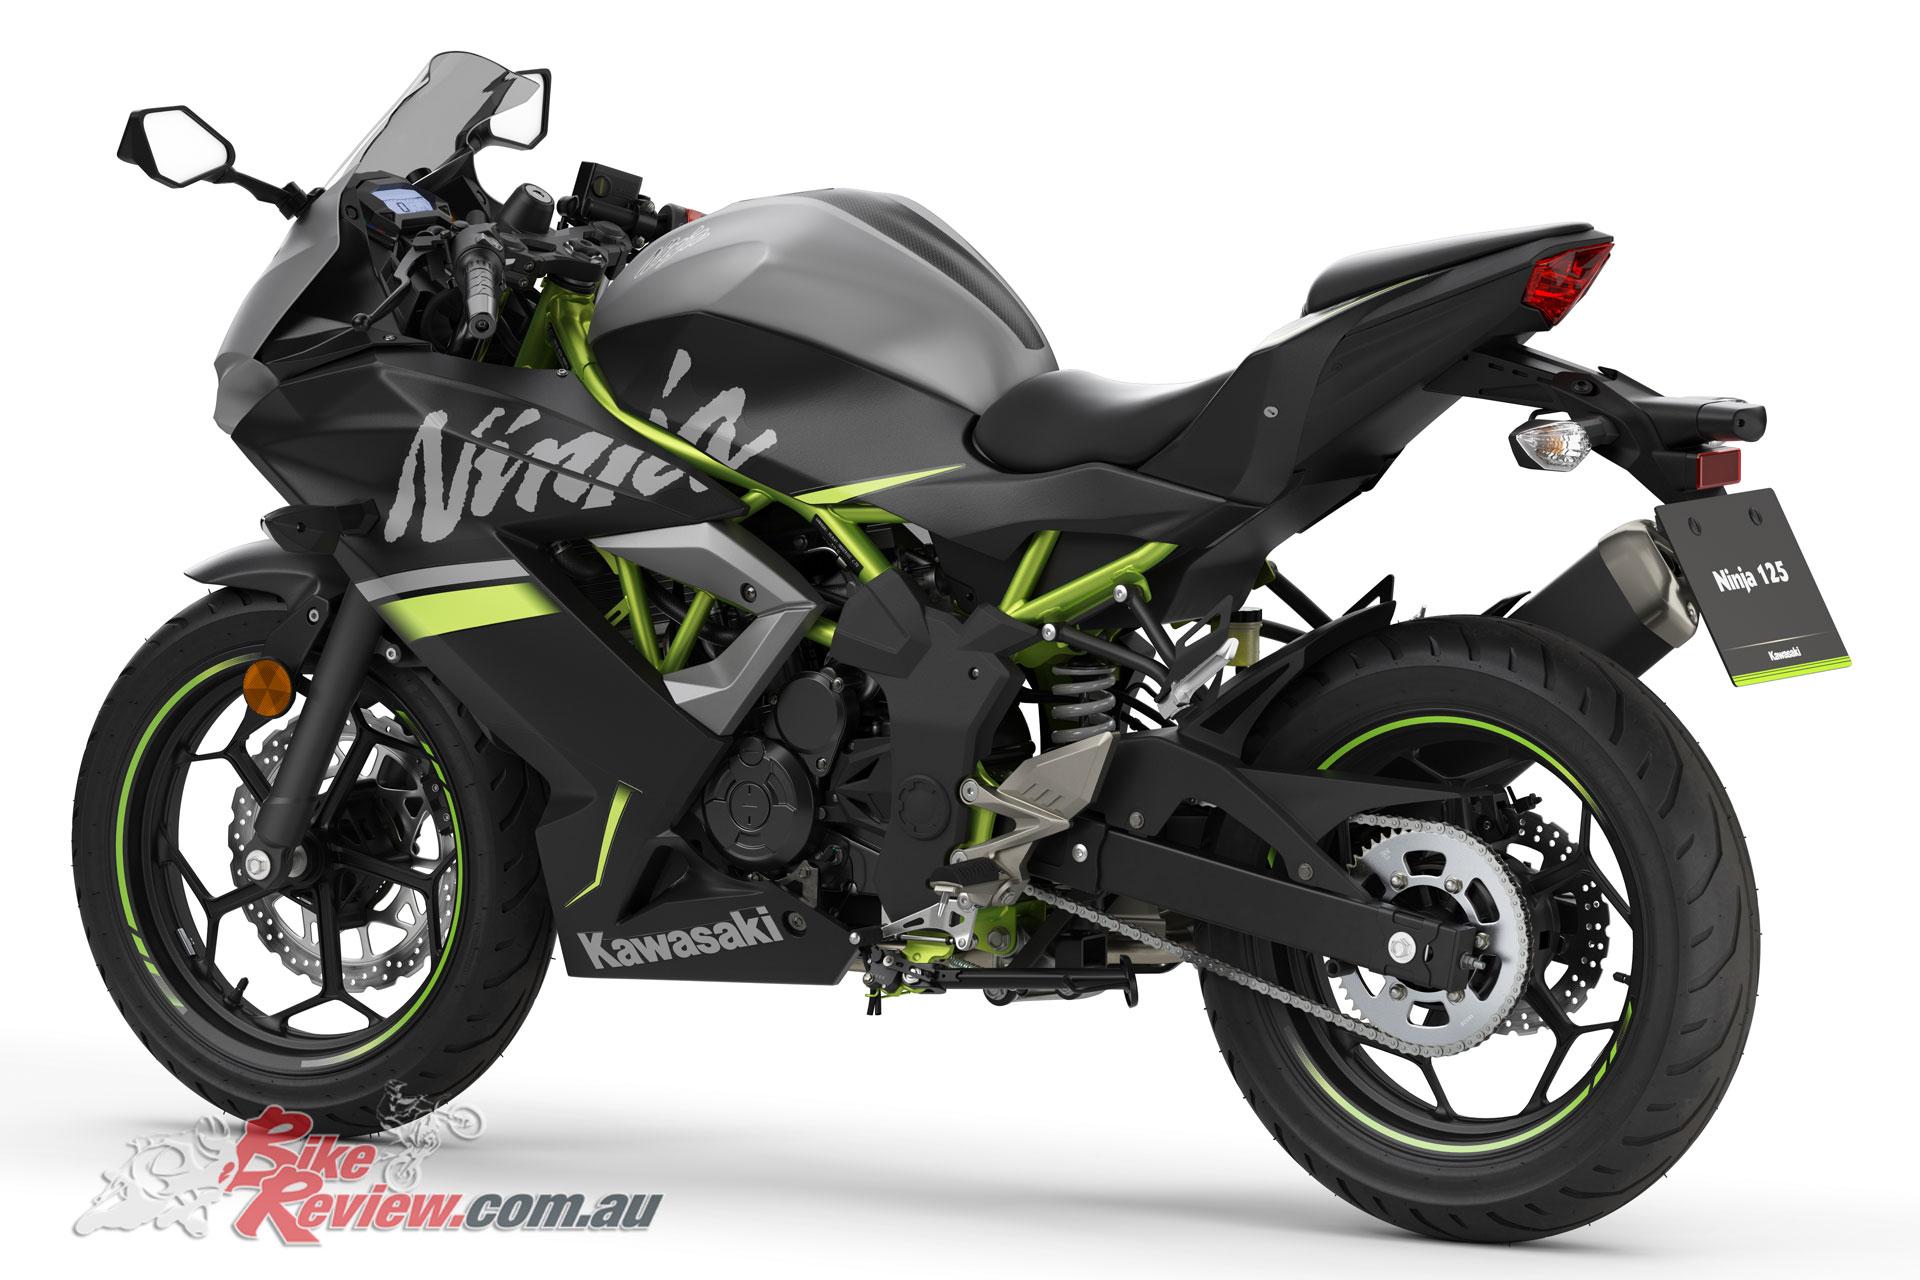 2019 Kawasaki Ninja 125 - Metallic Flat Spark Black